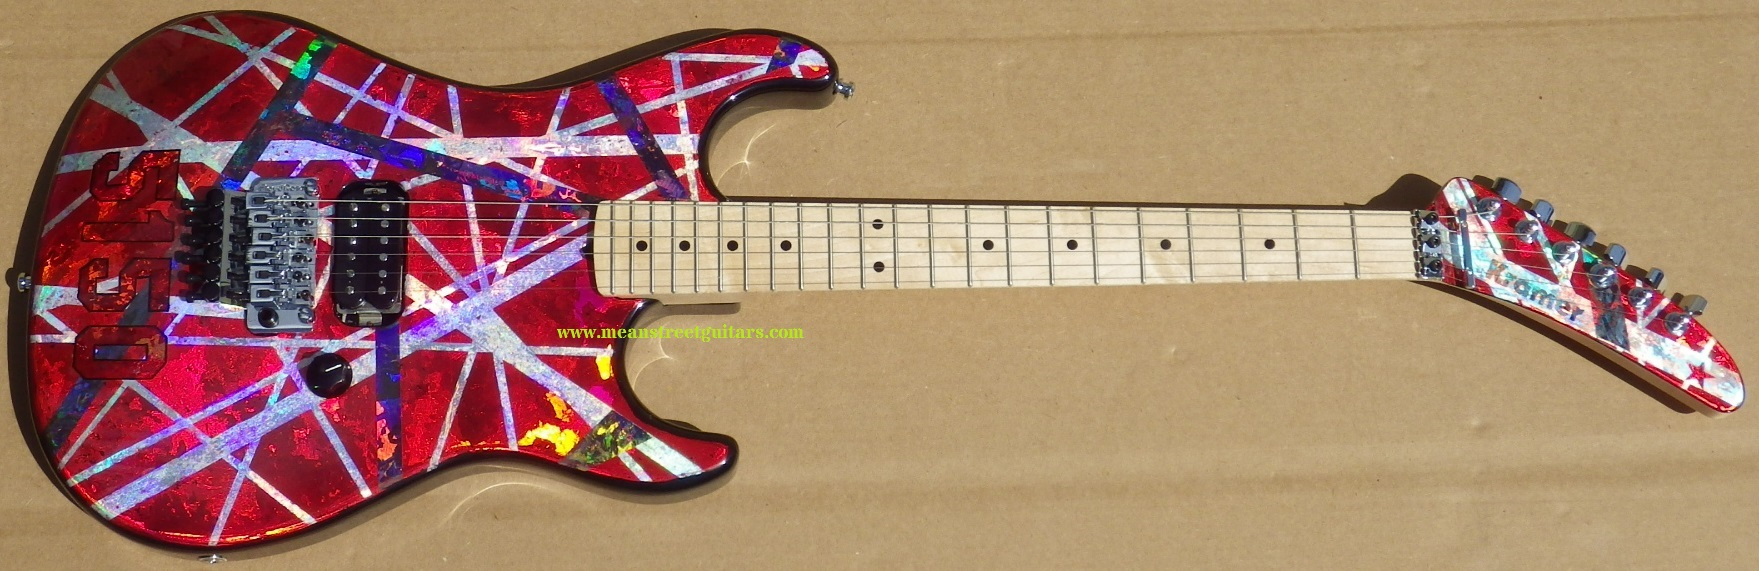 Mean Street Guitars LightFX Holo 5150 N1 pic 2.jpg